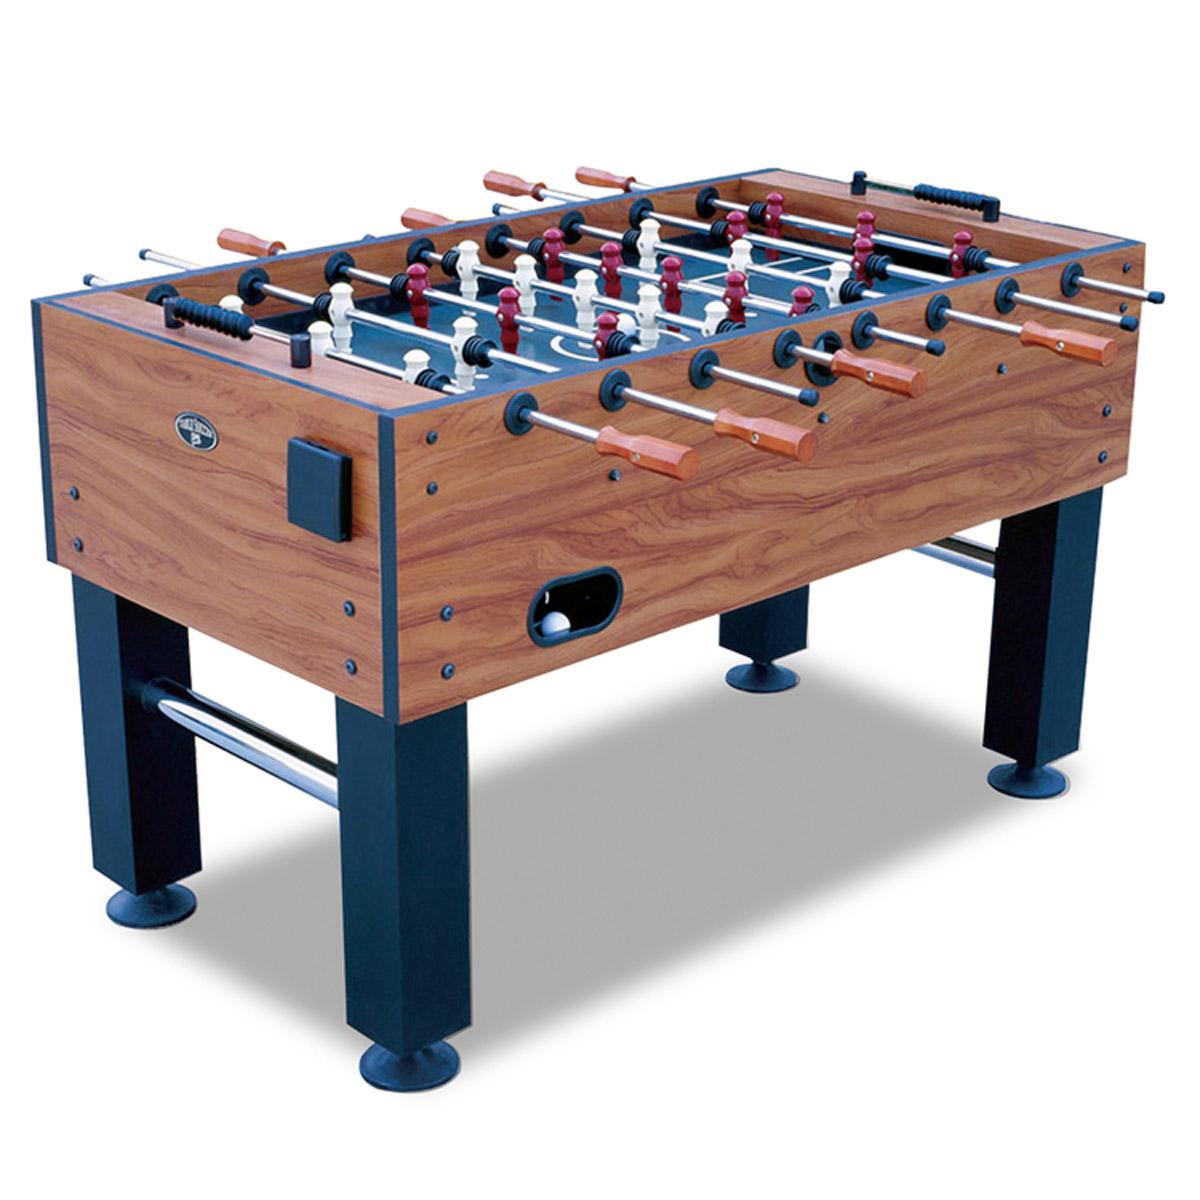 Bradford Foosball Table - GameTablesOnline.com